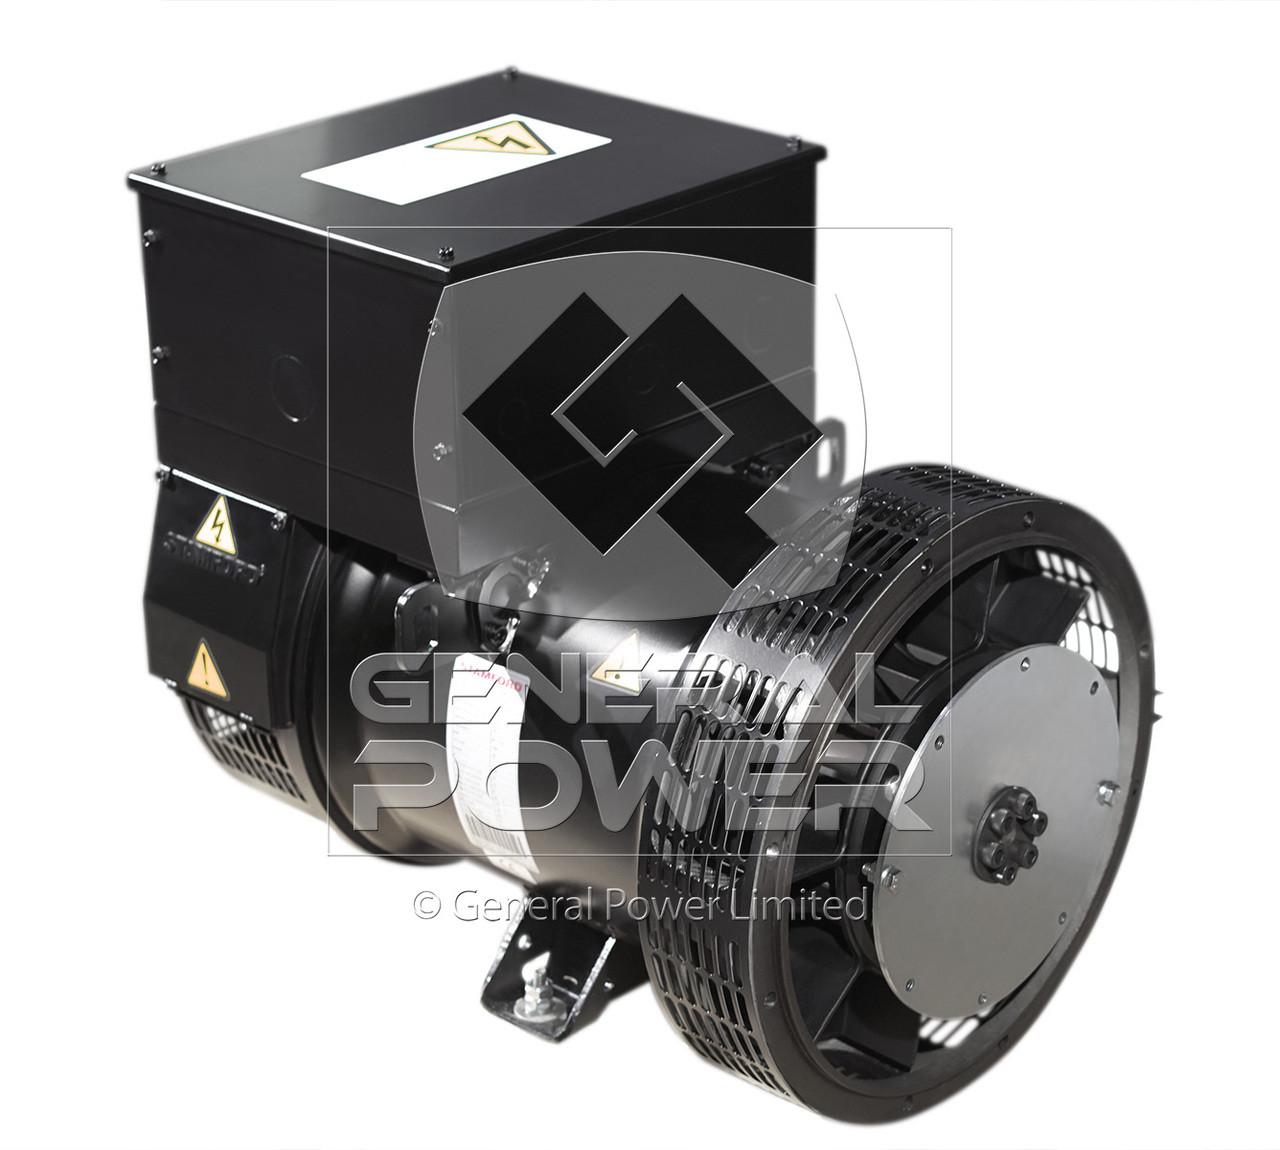 Stamford Pi044g Alternator Cummins Generator Newage Wiring Diagram Loading Zoom